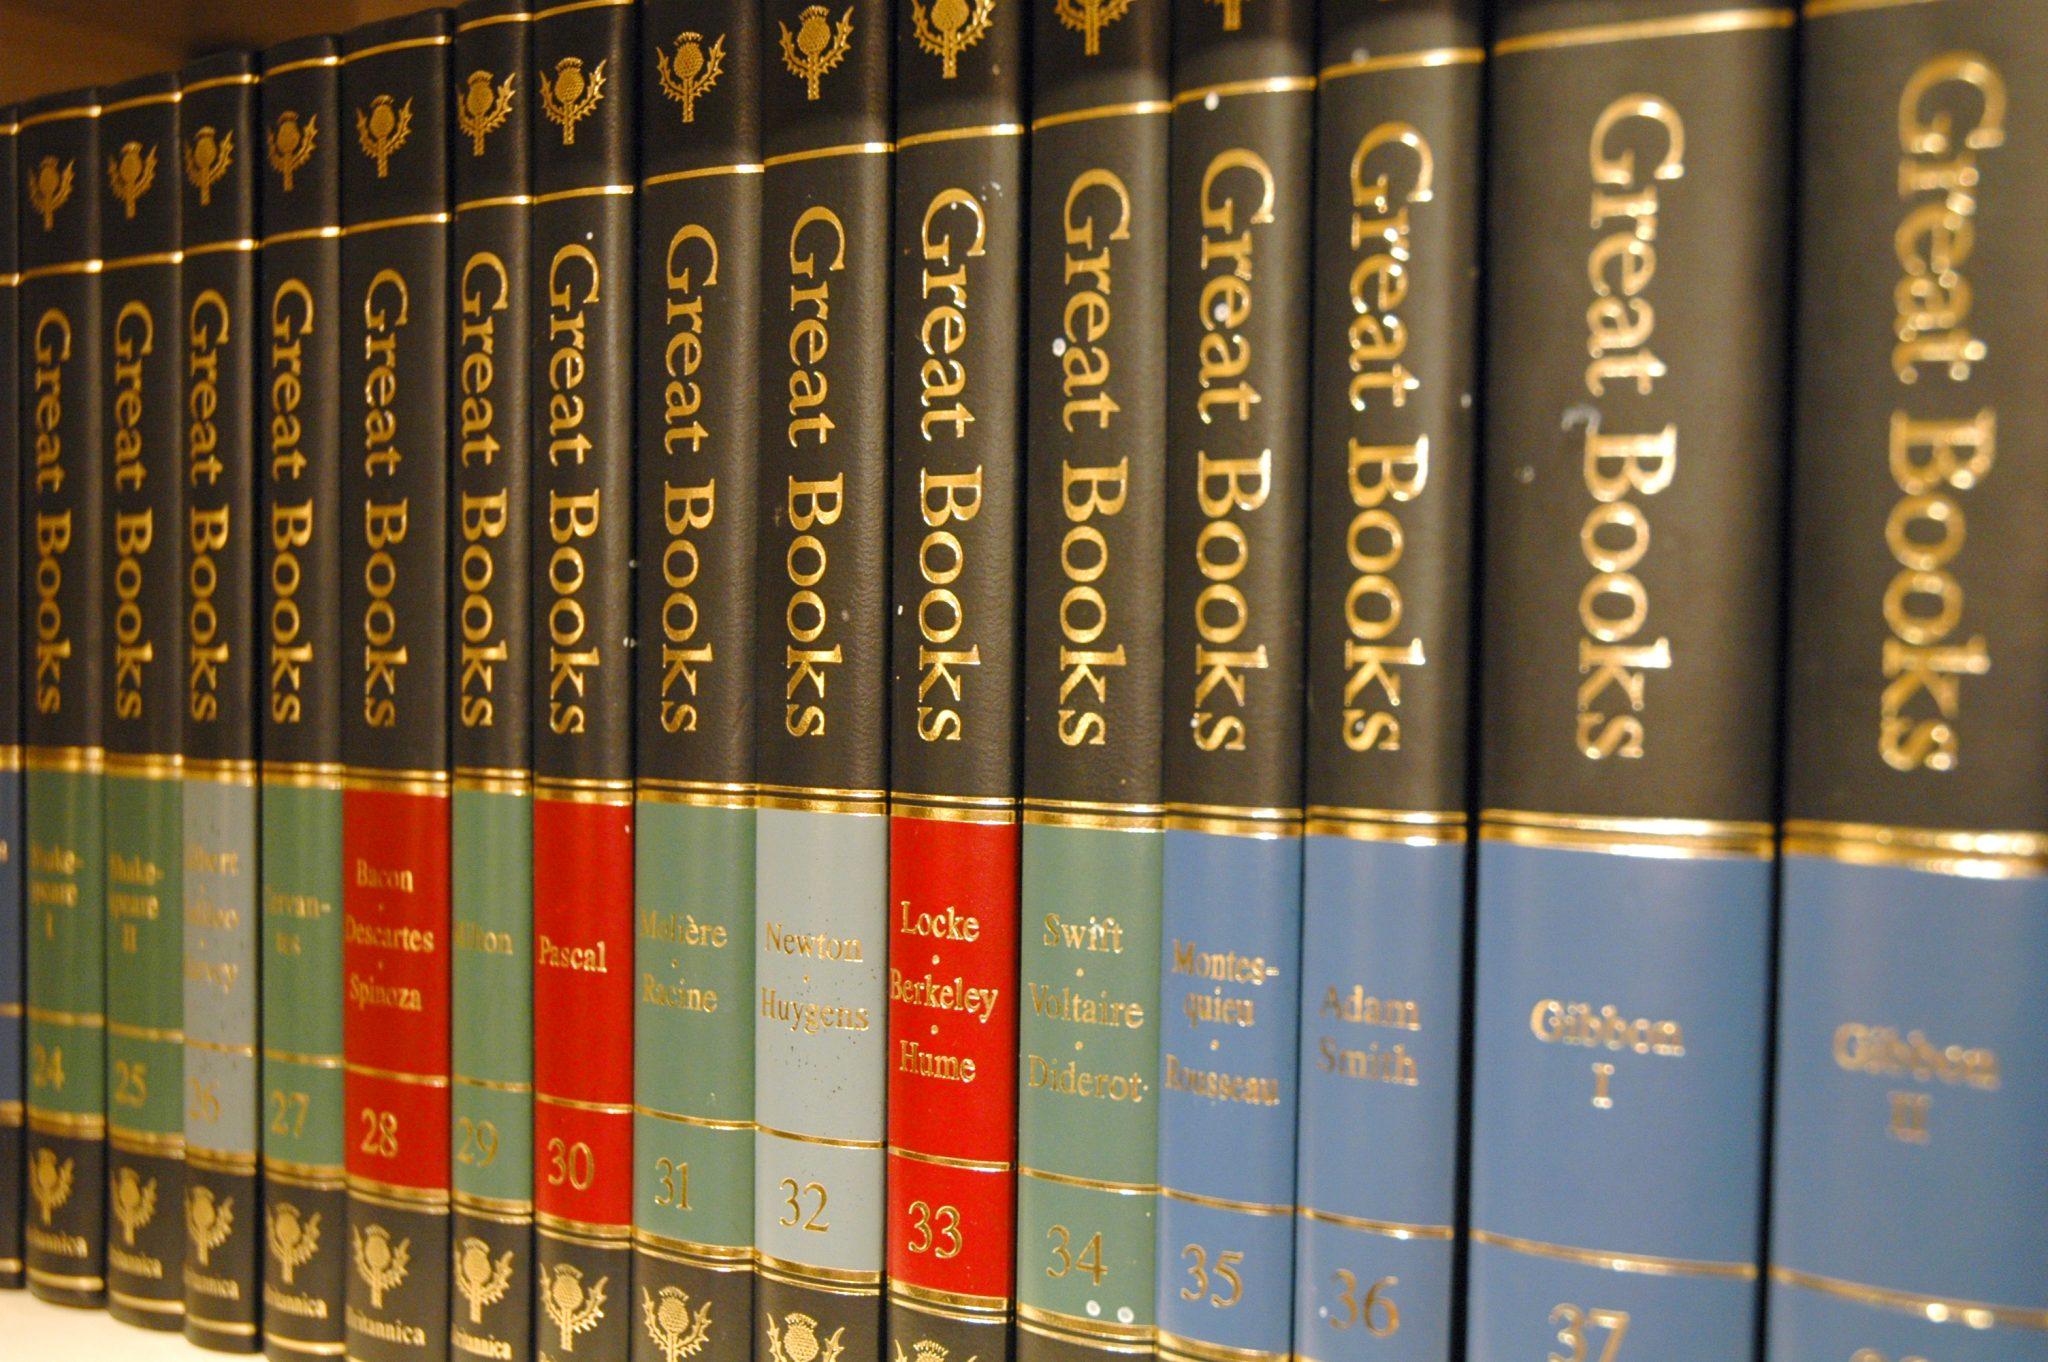 como ler livros enciclopedia